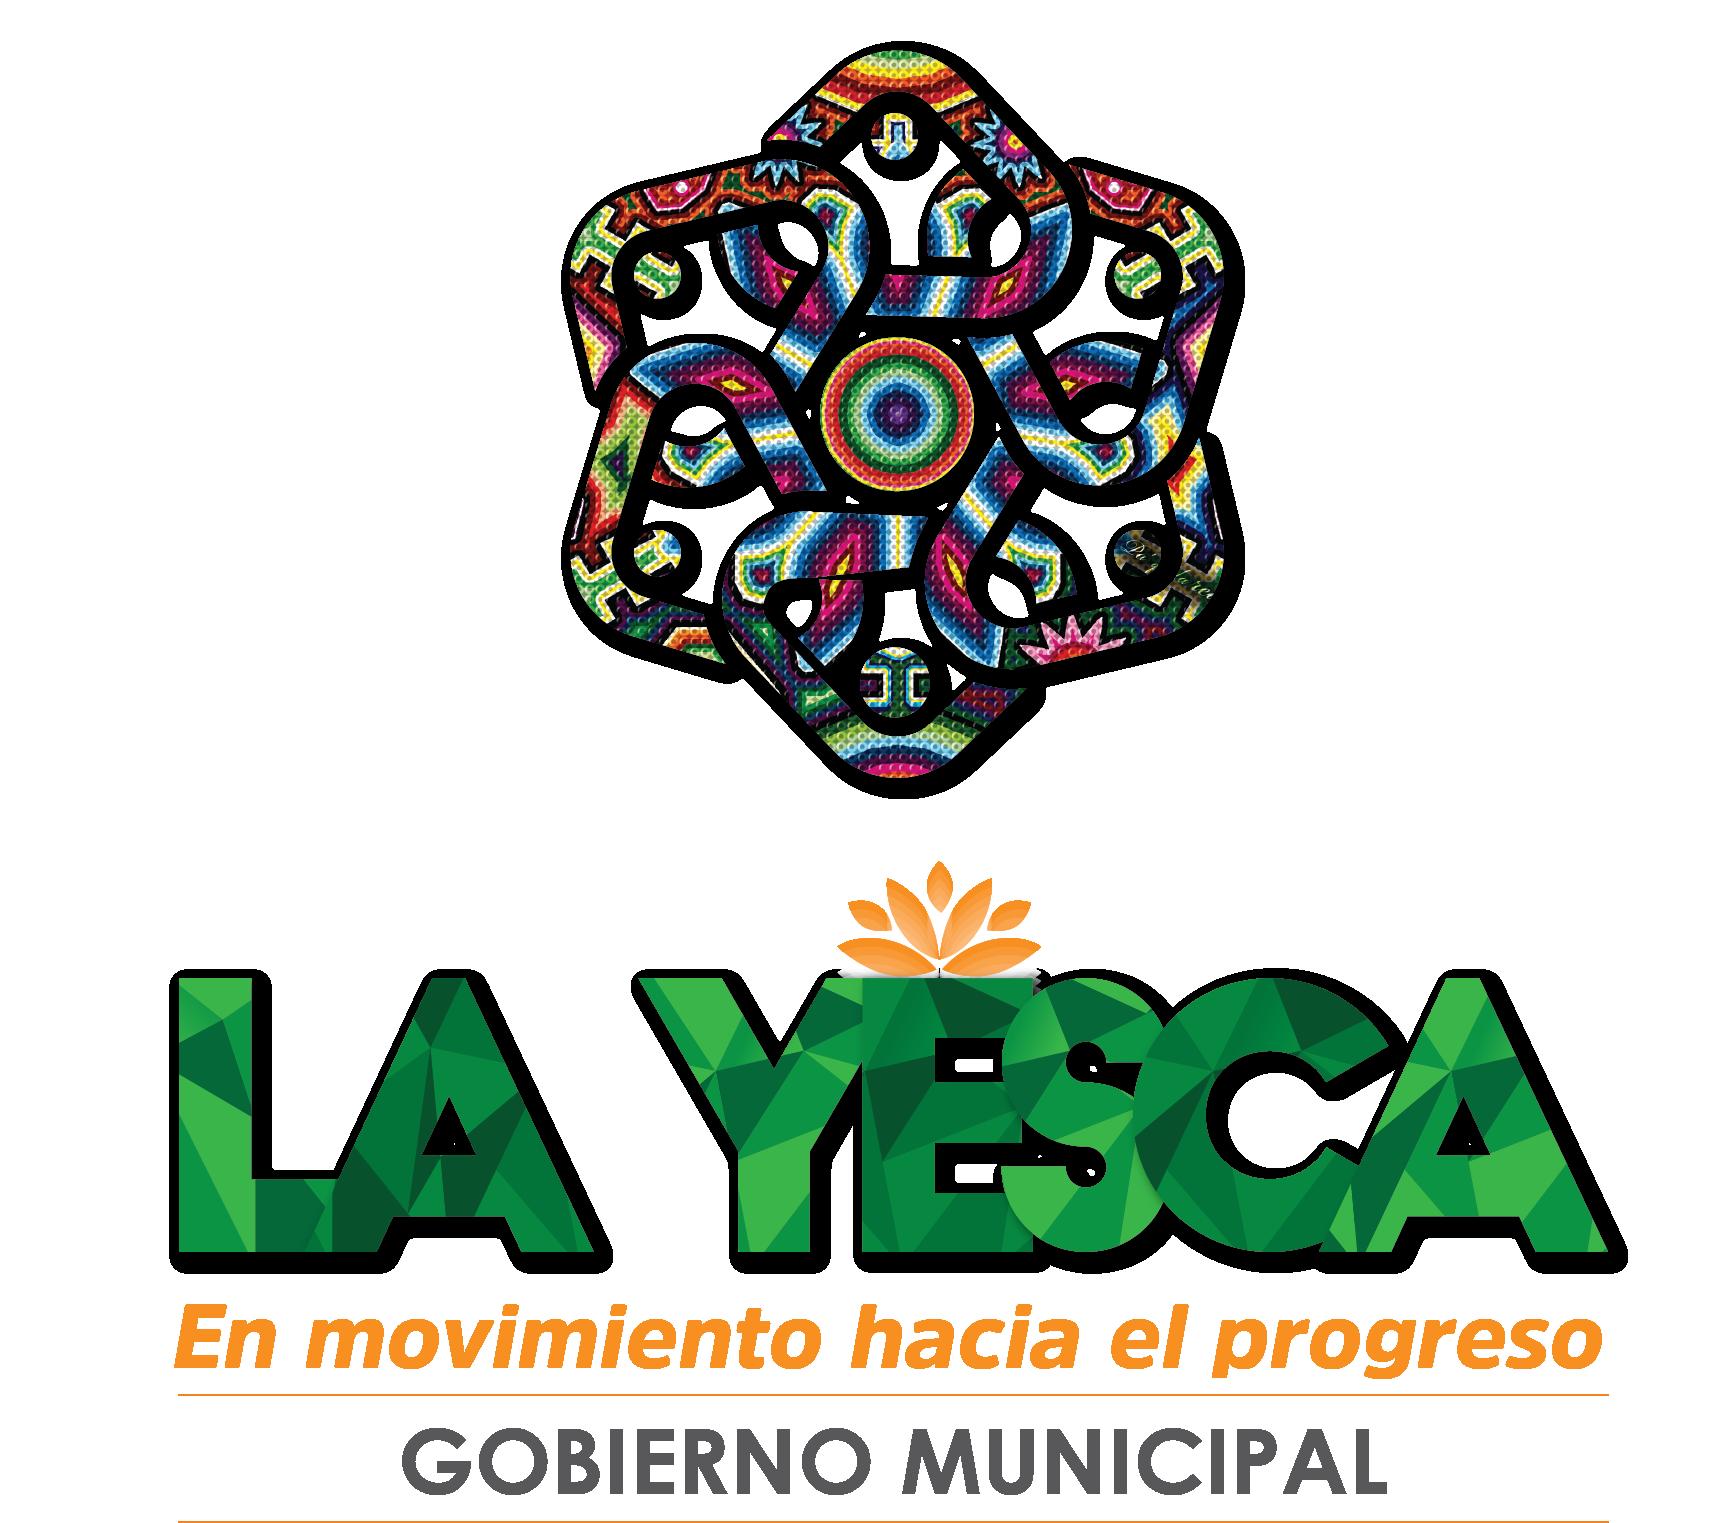 Municipio de la Yesca